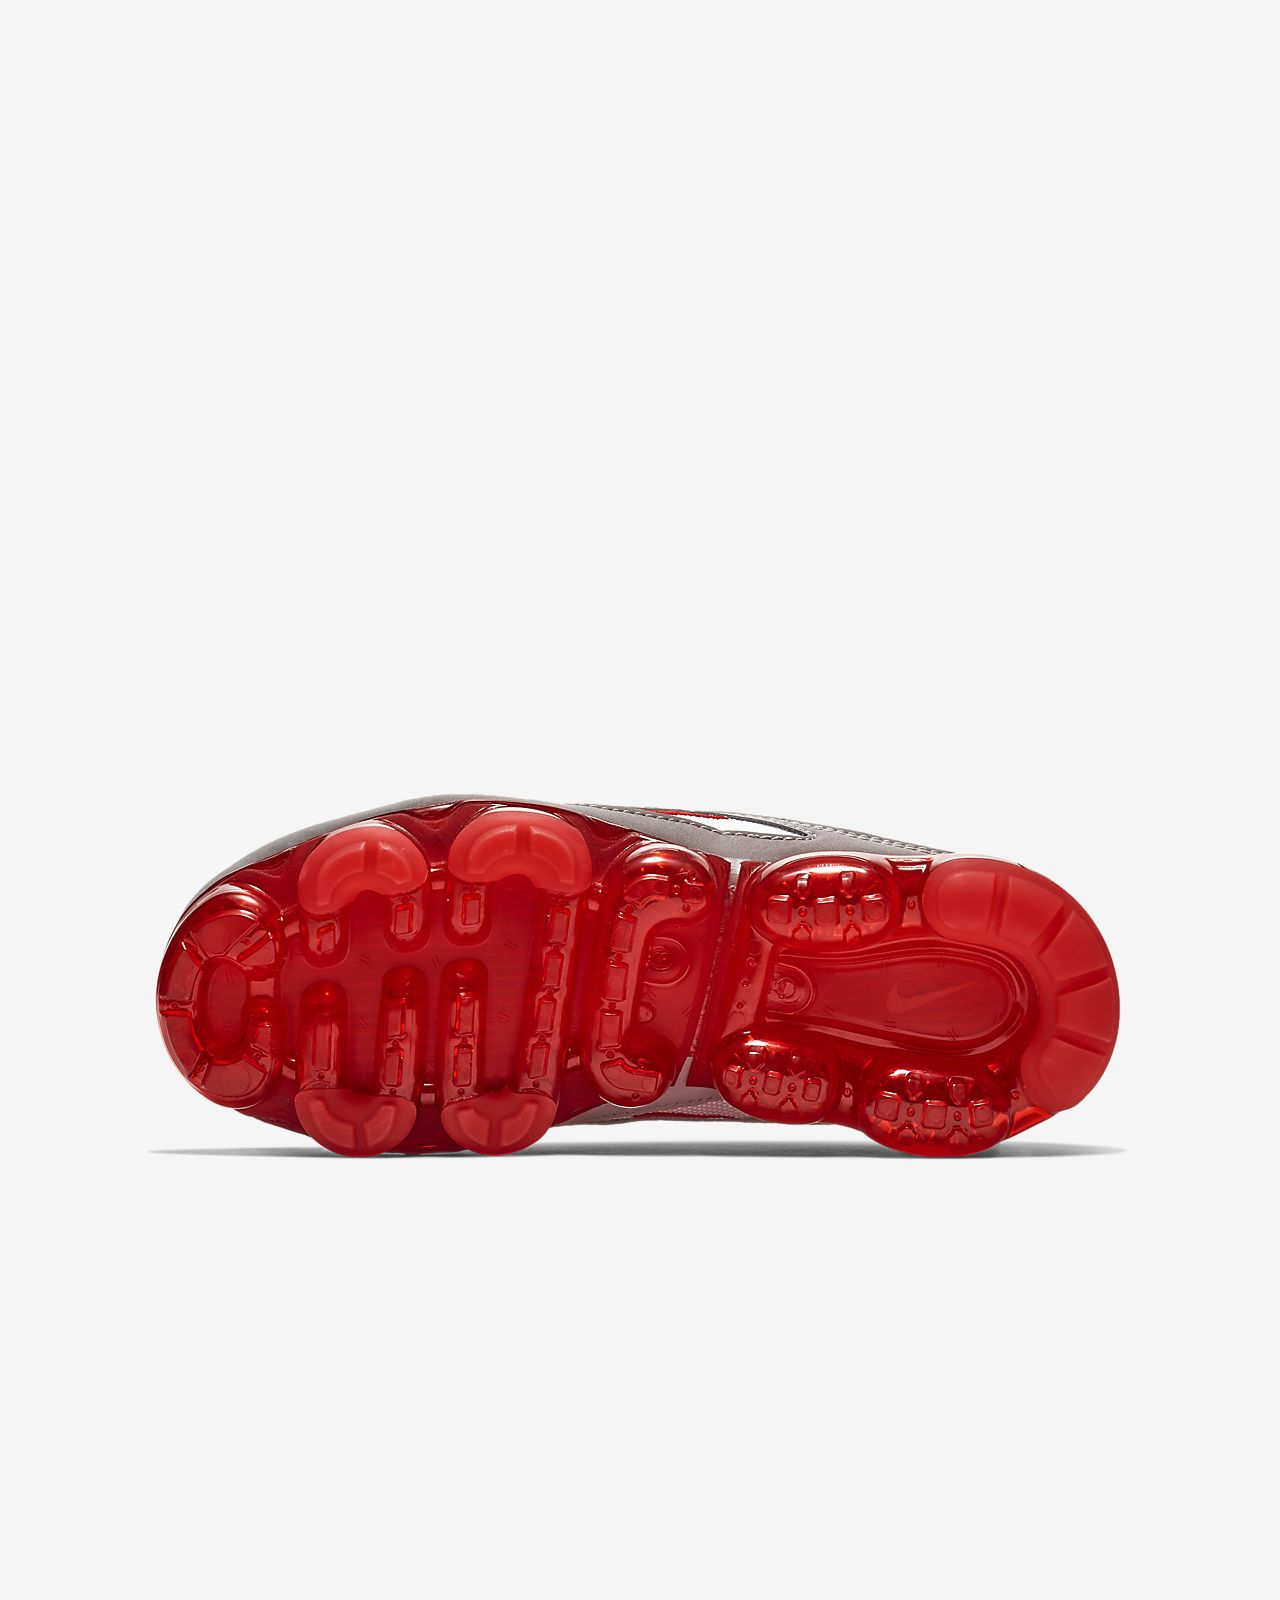 new styles 0ac44 81cb2 ... Nike Air VaporMax 97 Big Kids  Shoe